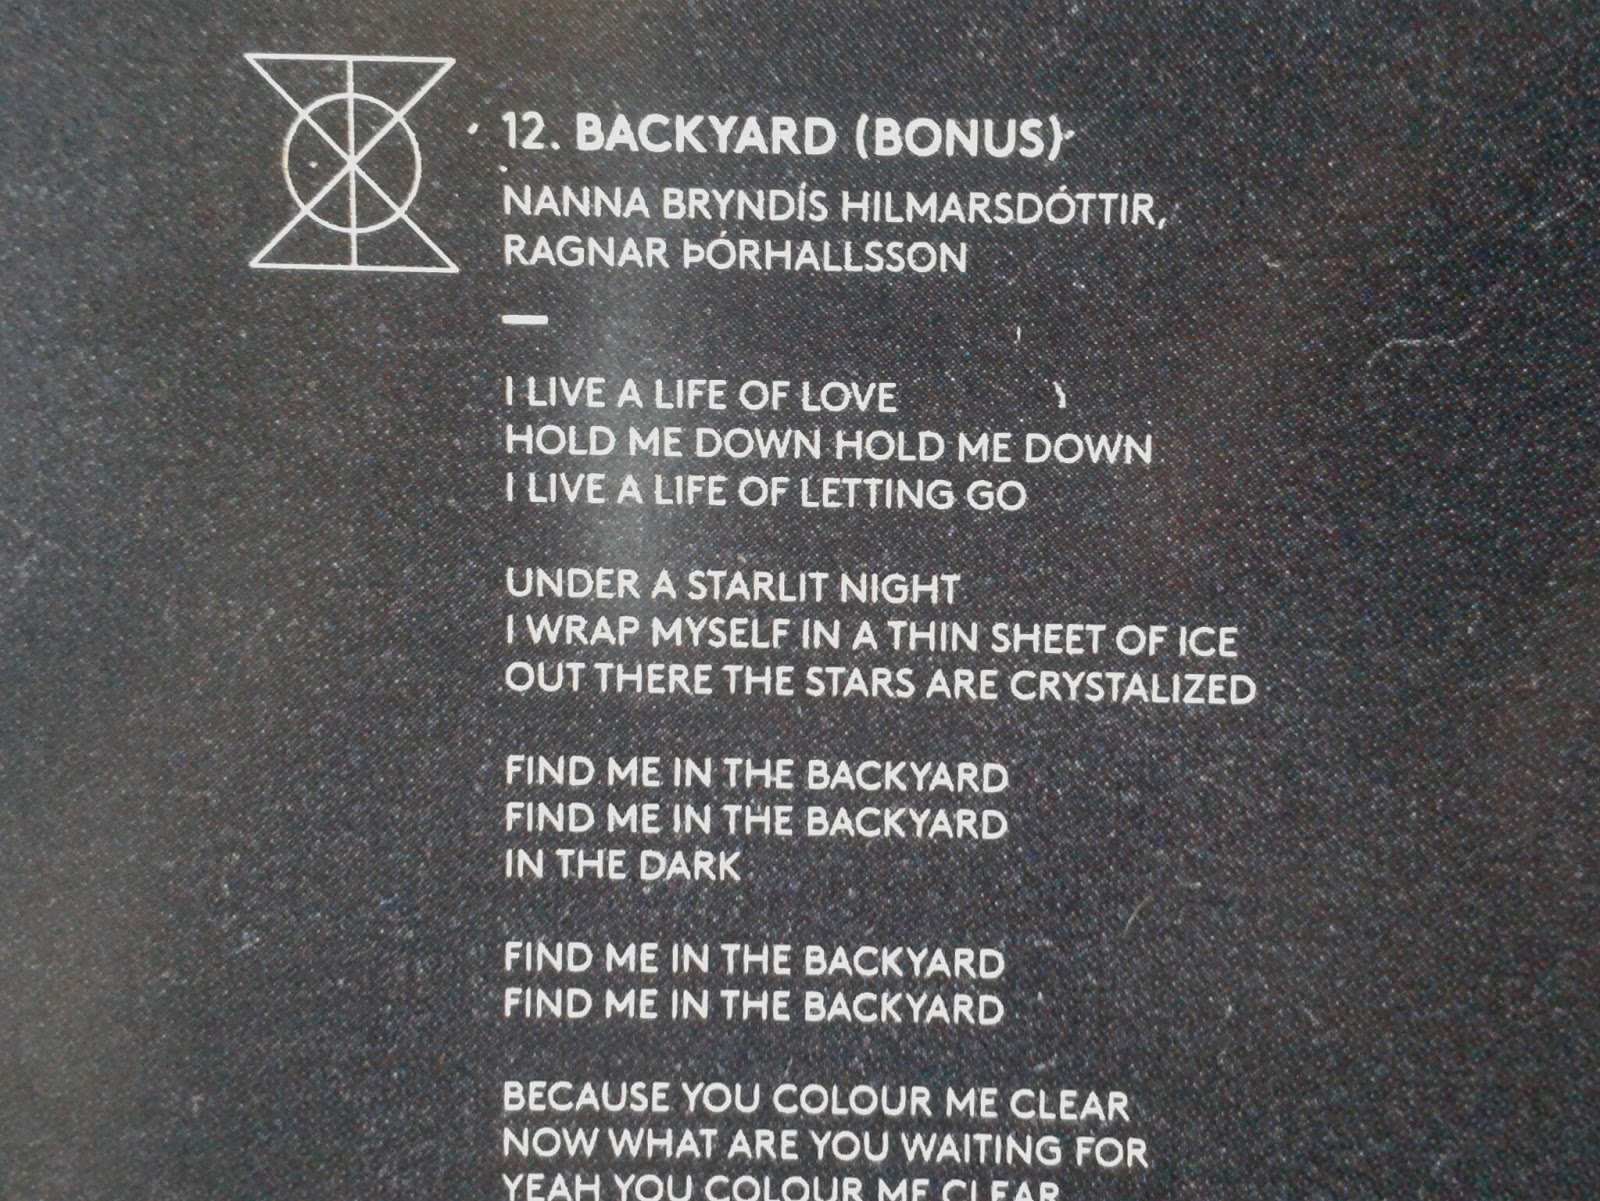 letra de backyard of monsters and men spain